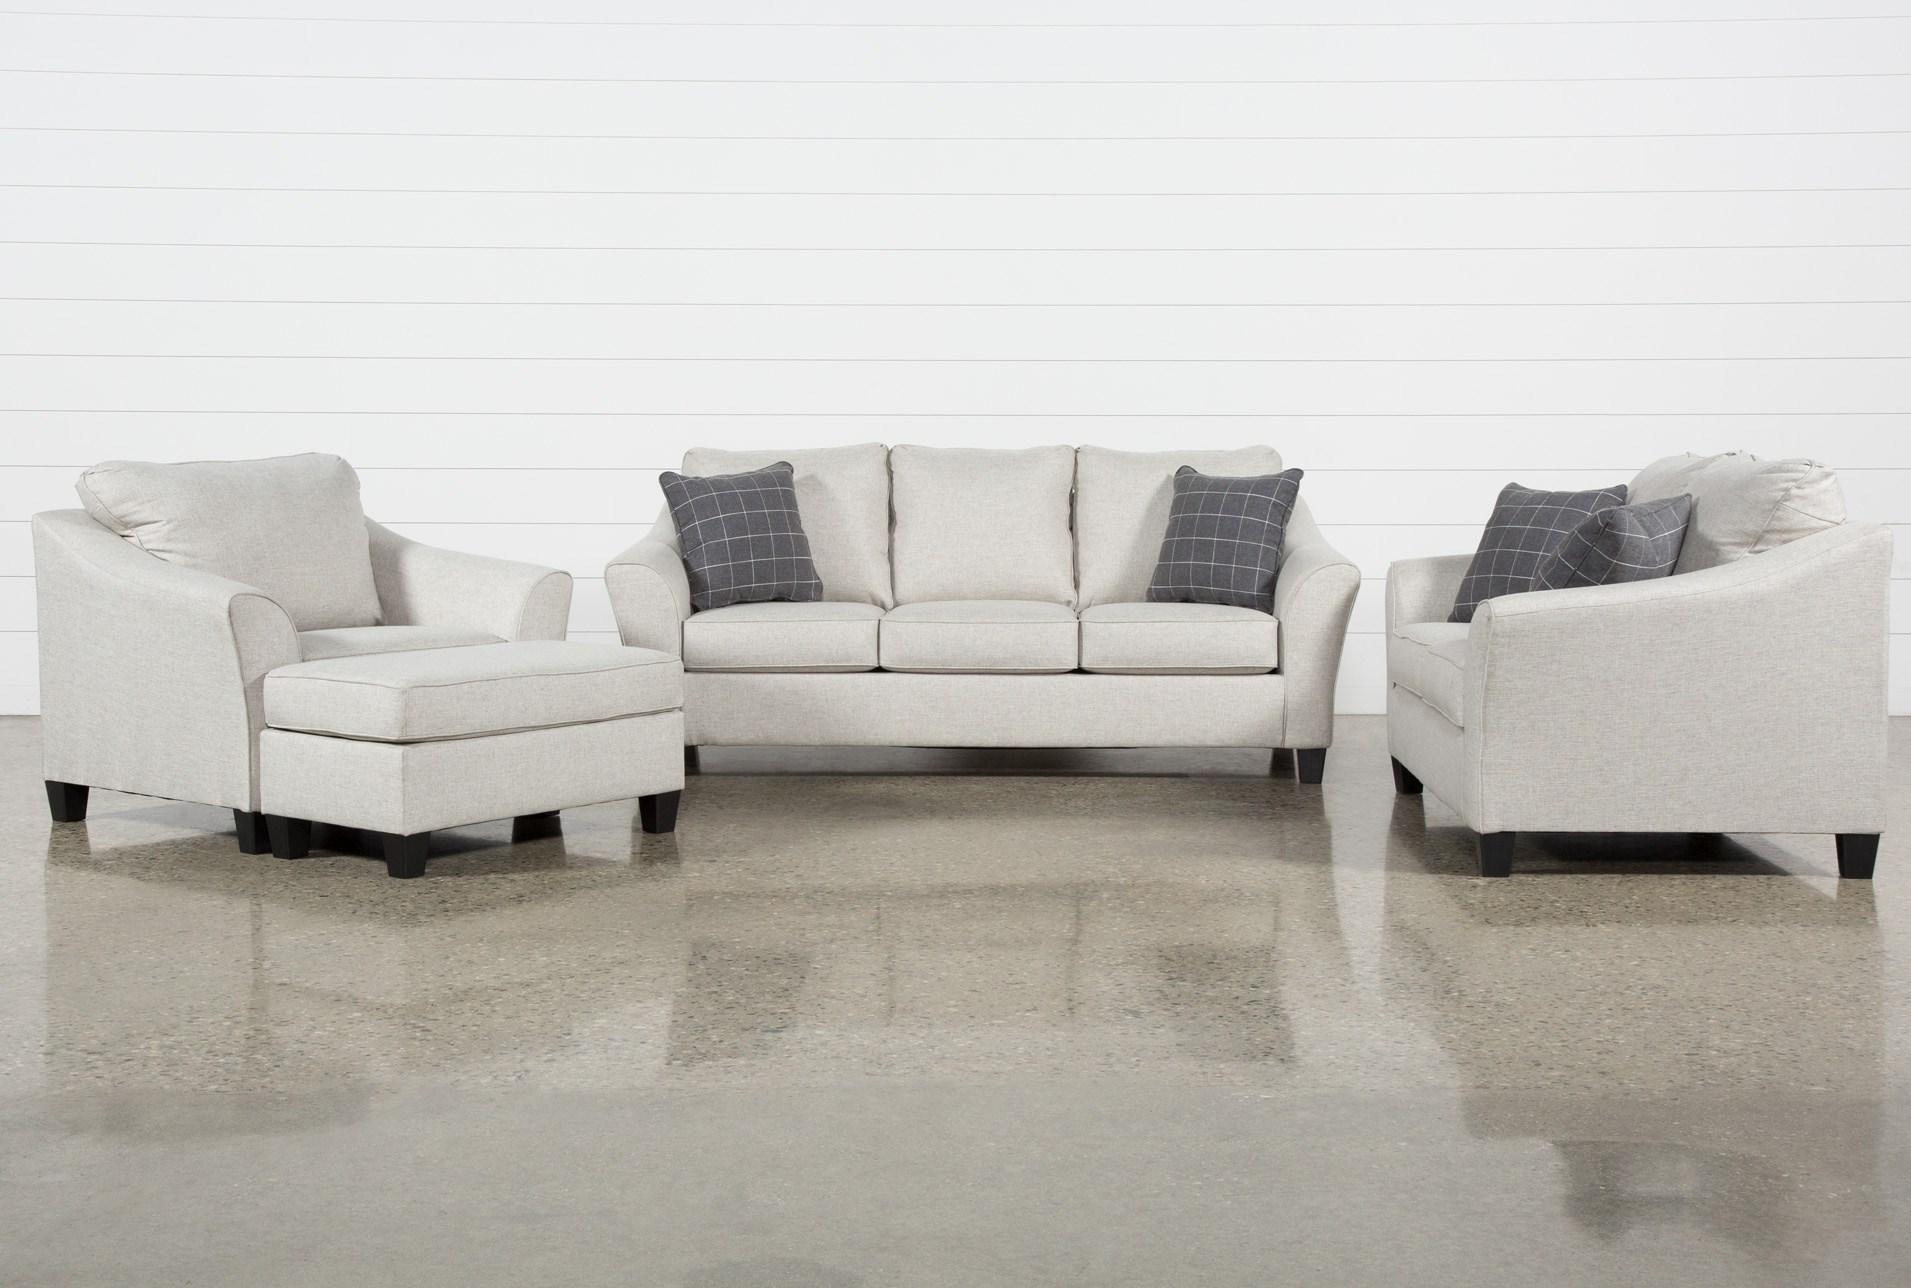 Kinsley 4 Piece Living Room Set With Queen Sleeper | Living Spaces